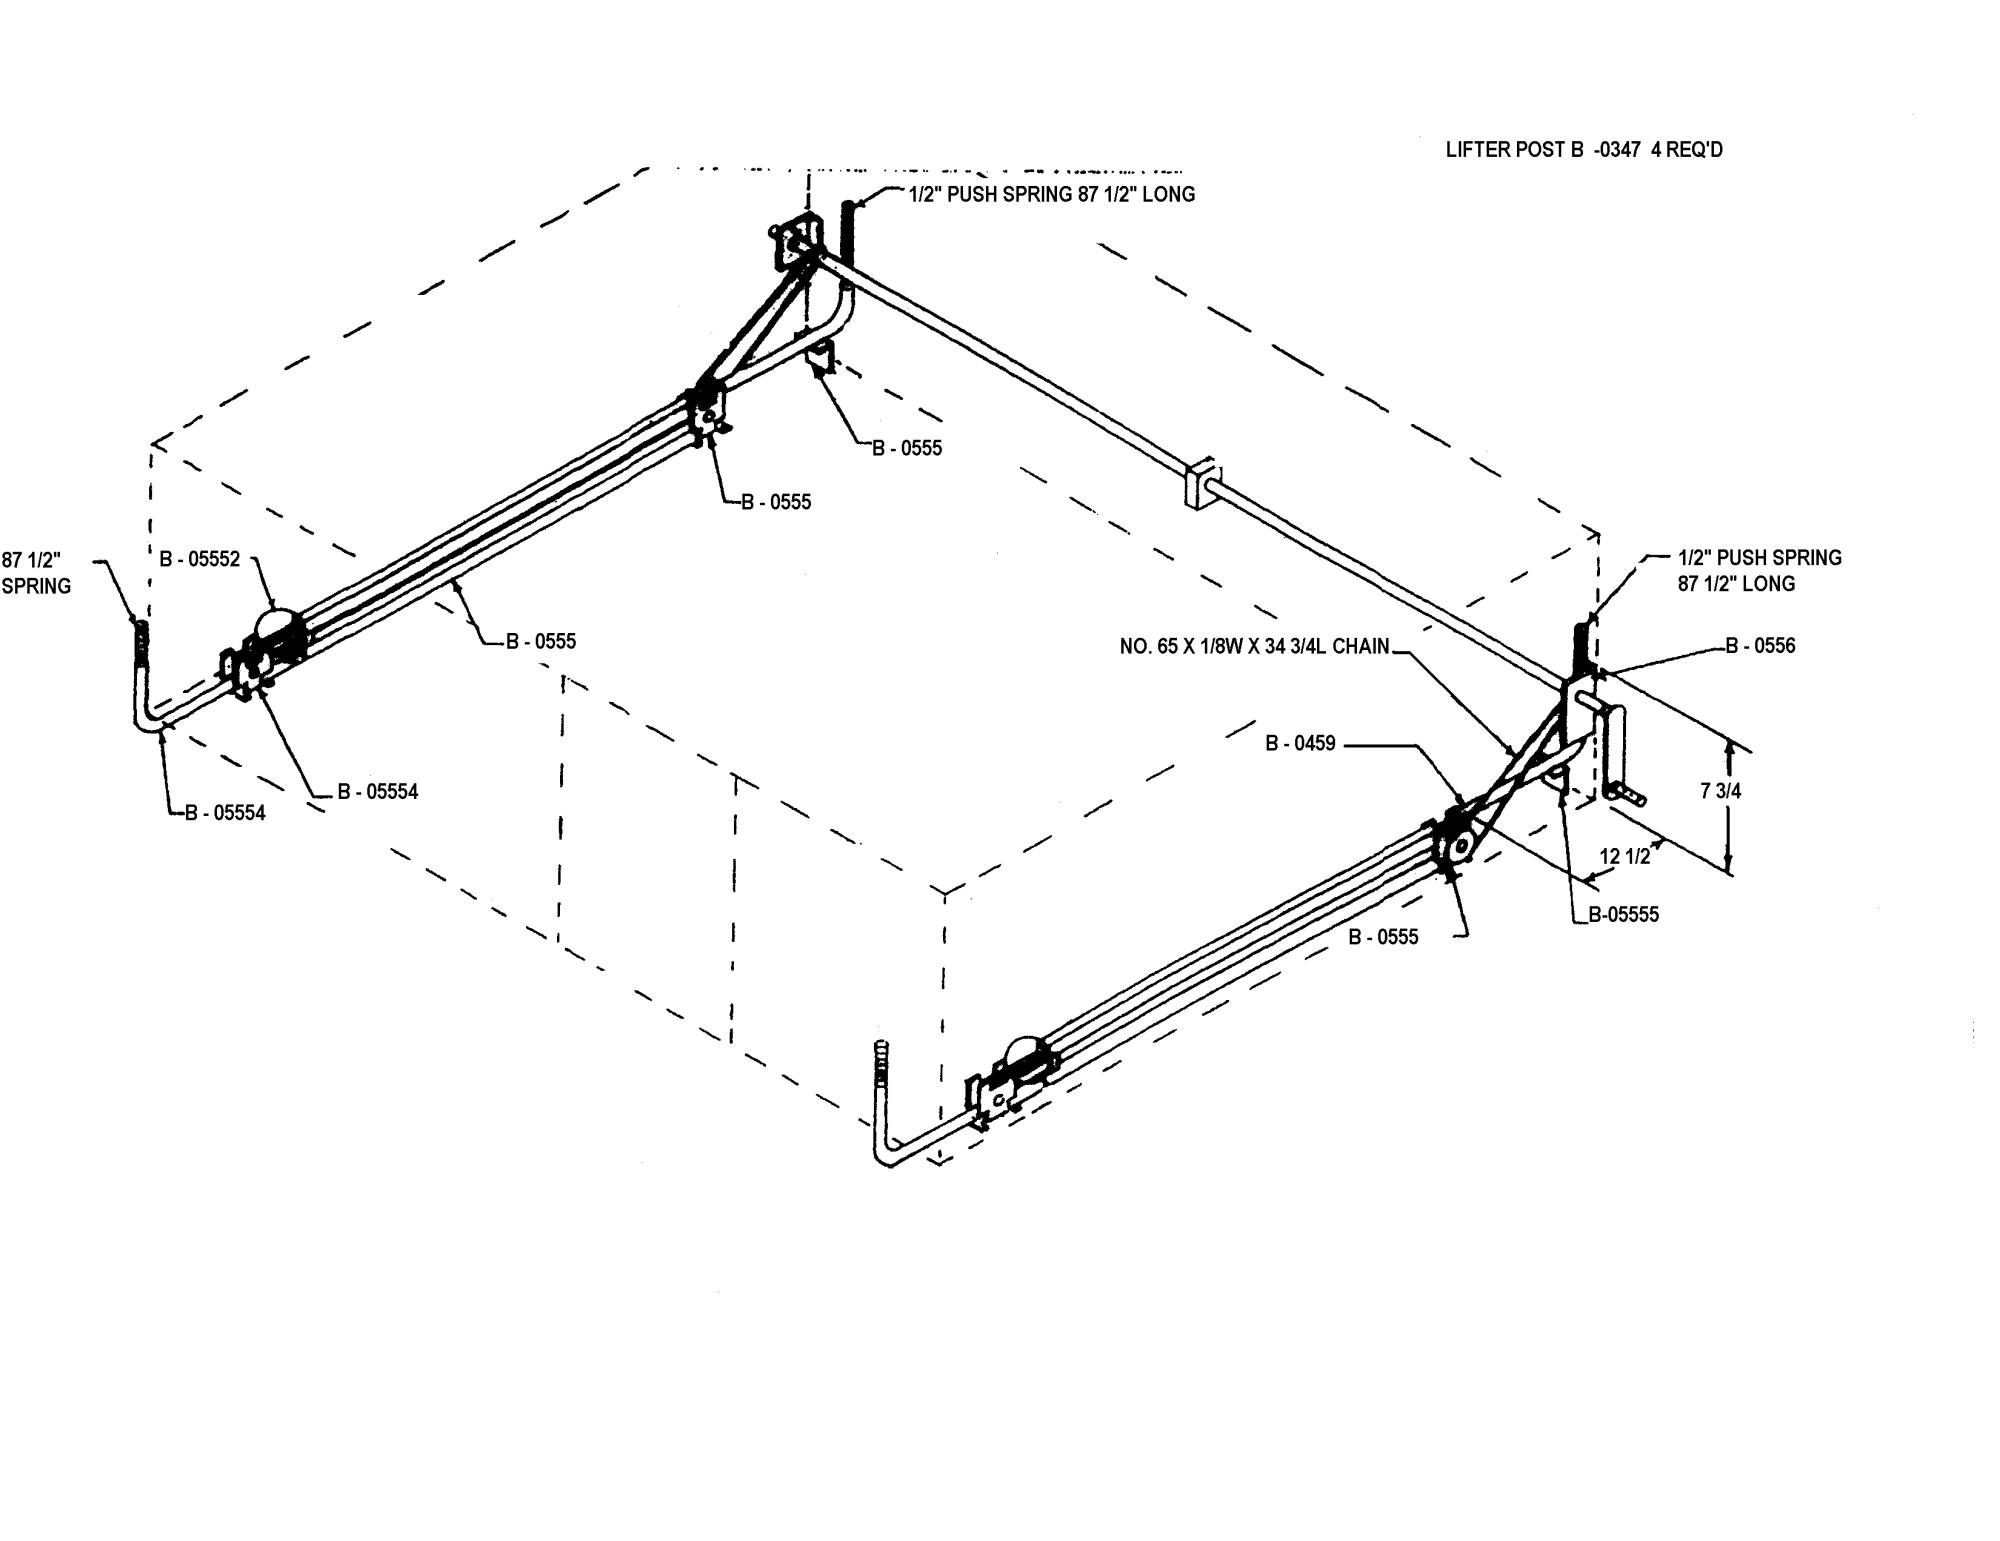 diagrams 960720 jayco motorhome wiring diagram rv wiring Rockwood Pop Up  Camper Lift Maintenance 5?resize\=665%2C512 diagrams 960720